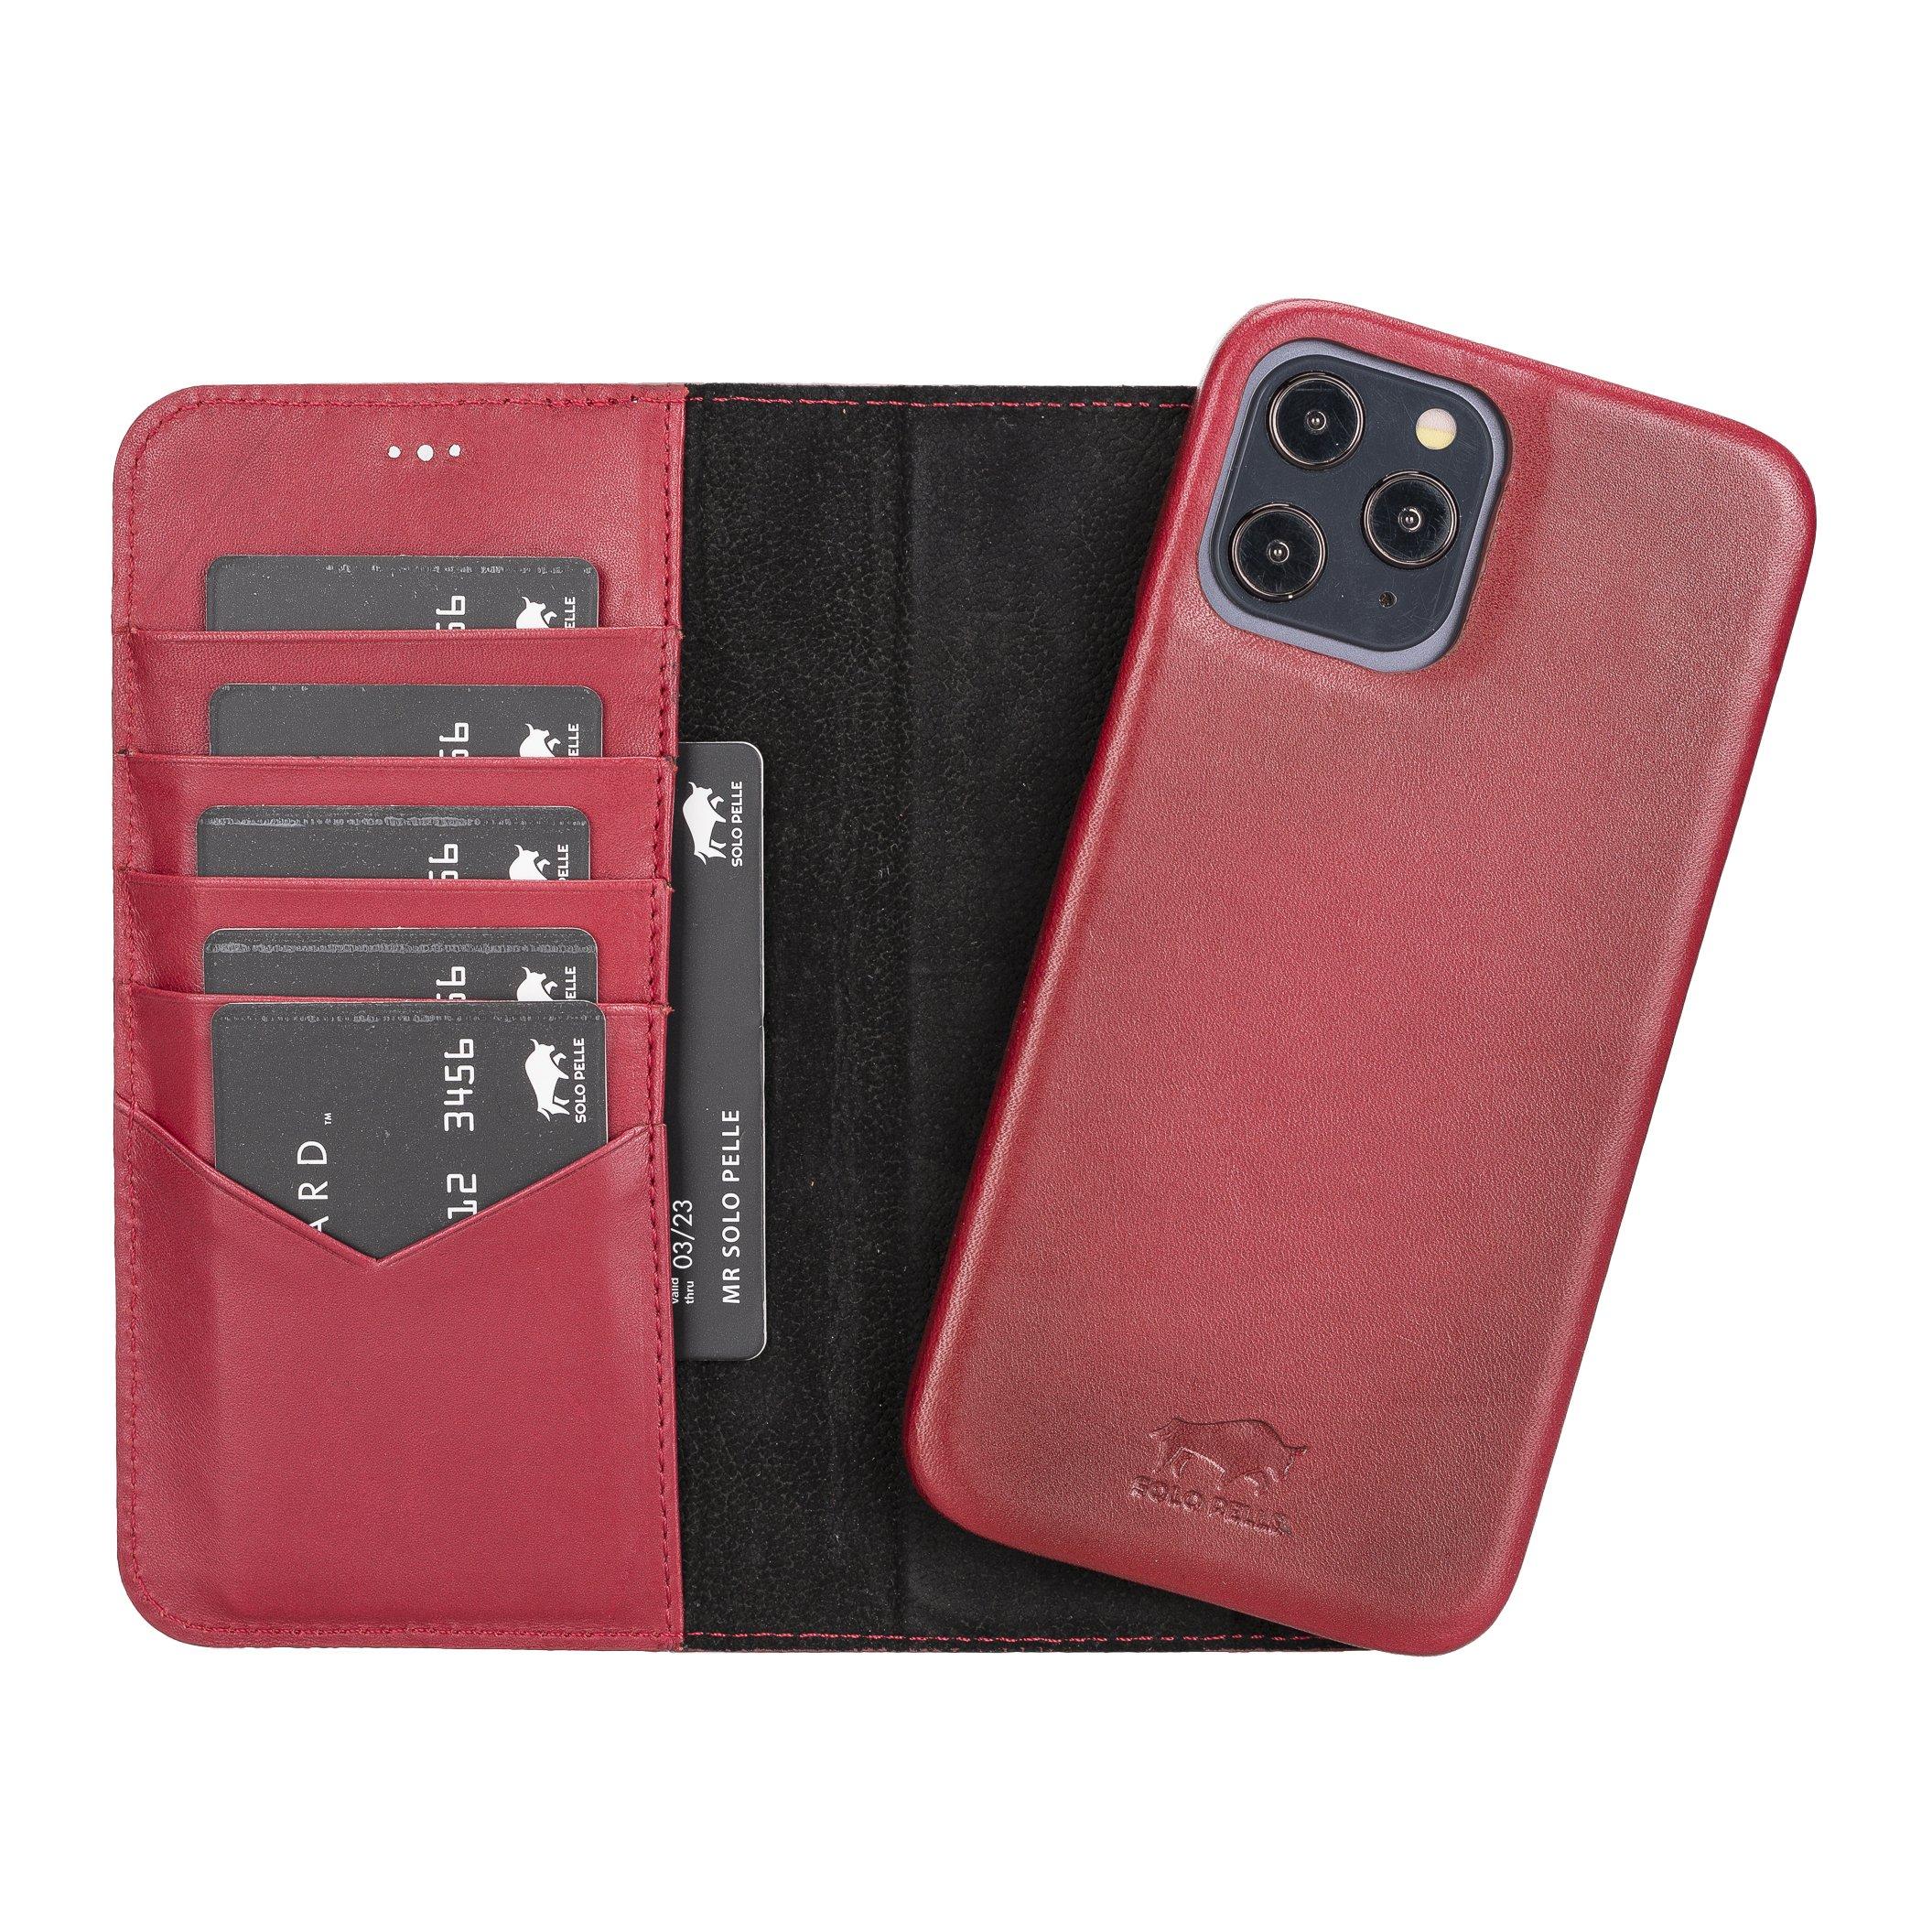 Solo Pelle Lederhülle kompatibel für iPhone 12 Pro Max in 6.7 Zoll abnehmbare Hülle (2in1) inkl. Kartenfächer für das original Apple iPhone 12 Pro Max (Vollleder Rot Effekt)